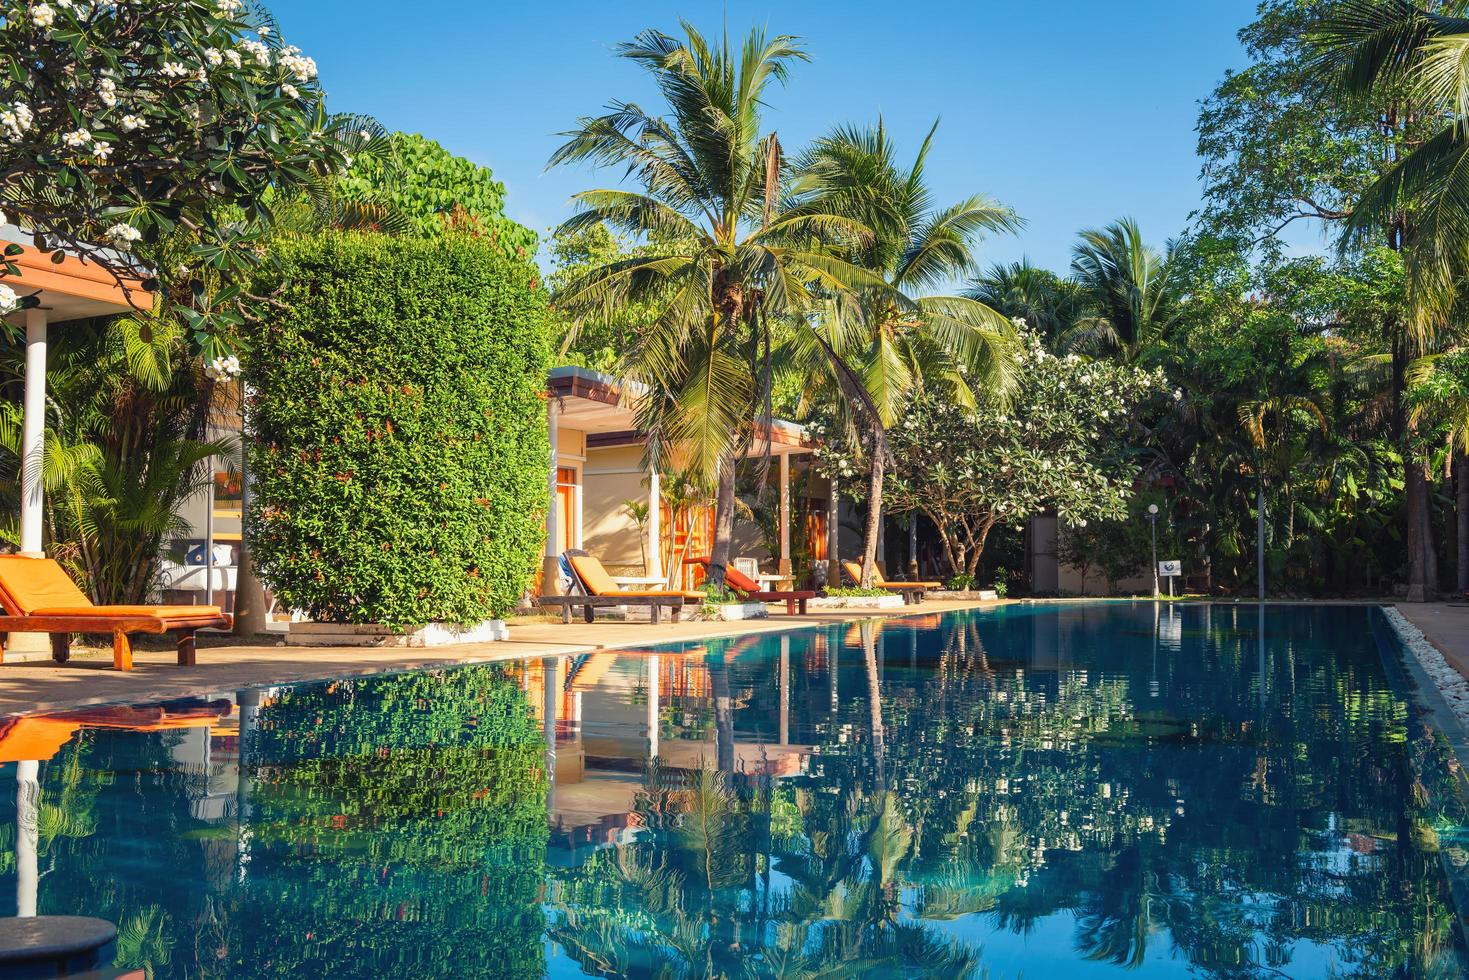 scène de piscine au resort photo